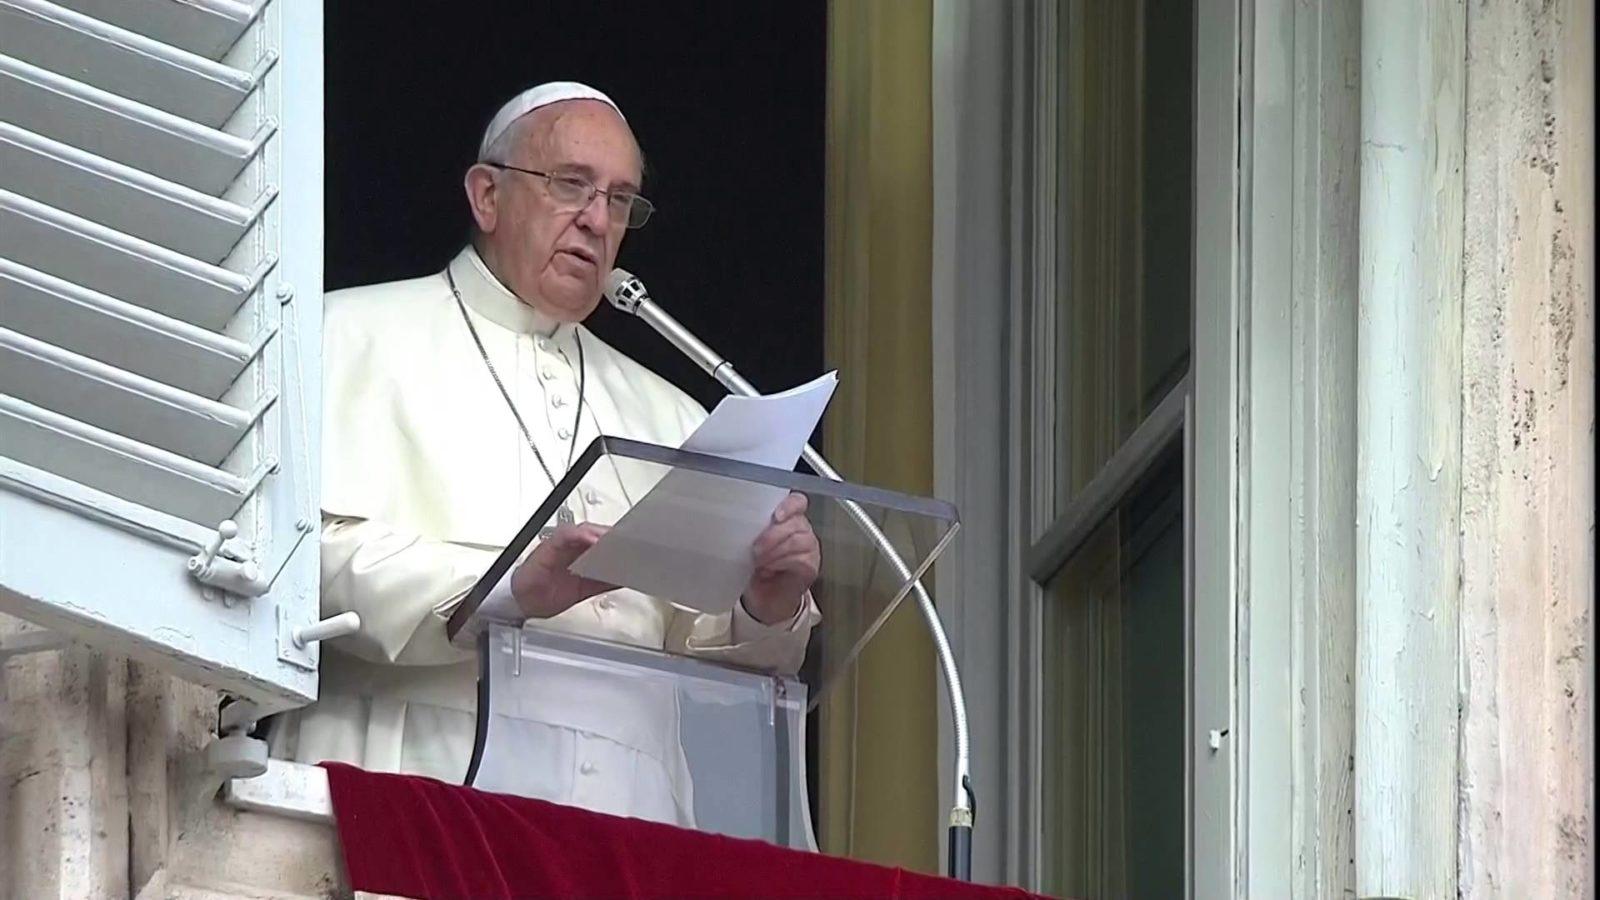 Papa Francesco, Angelus, suore, Yemen, corridoi umanitari, comunità di Sant'Egidio, valdesi, metodisti, padre buono